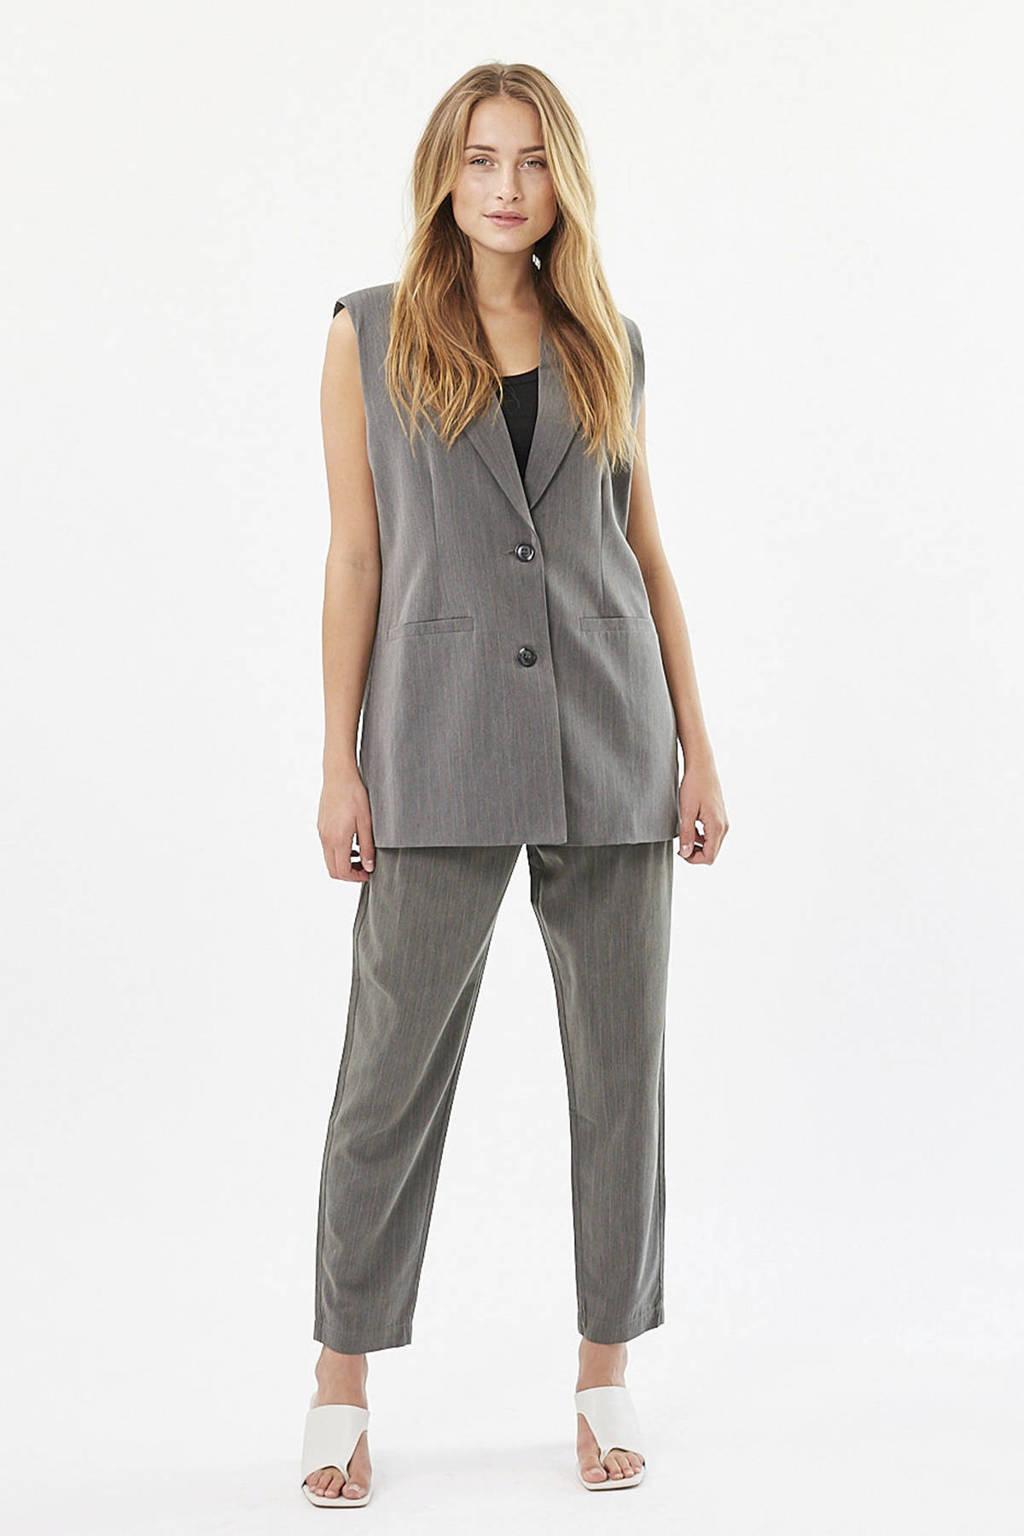 Moves cropped high waist pantalon Nimalli met krijtstreep grijs melange, Grijs melange